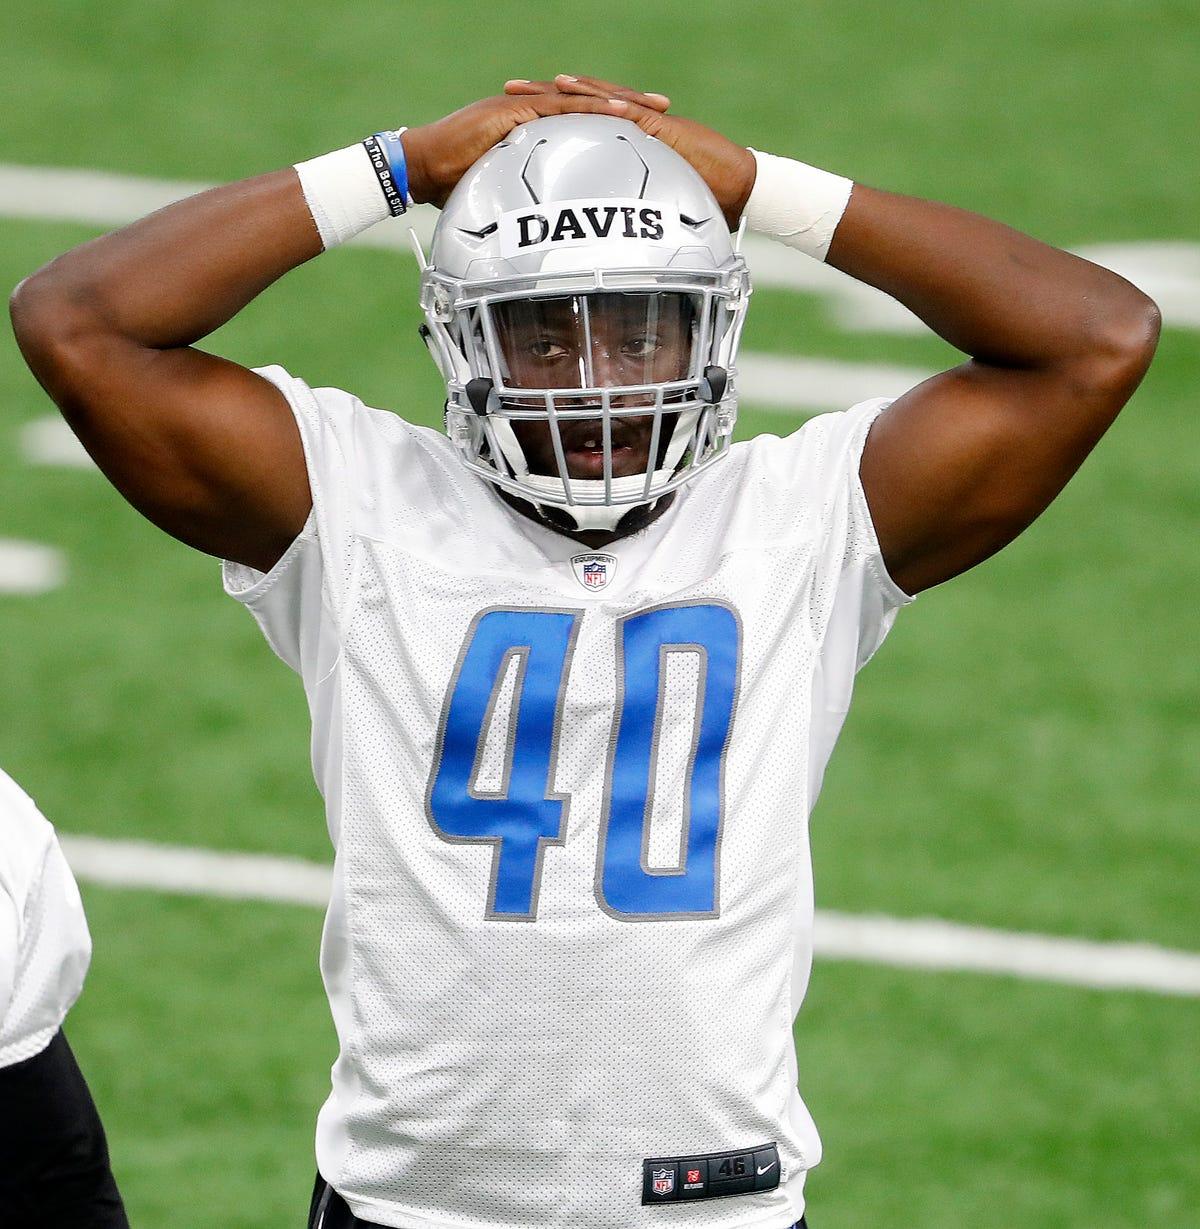 dea8b147 Lead dog: Rookie or not, Jarrad Davis will direct Detroit Lions defense